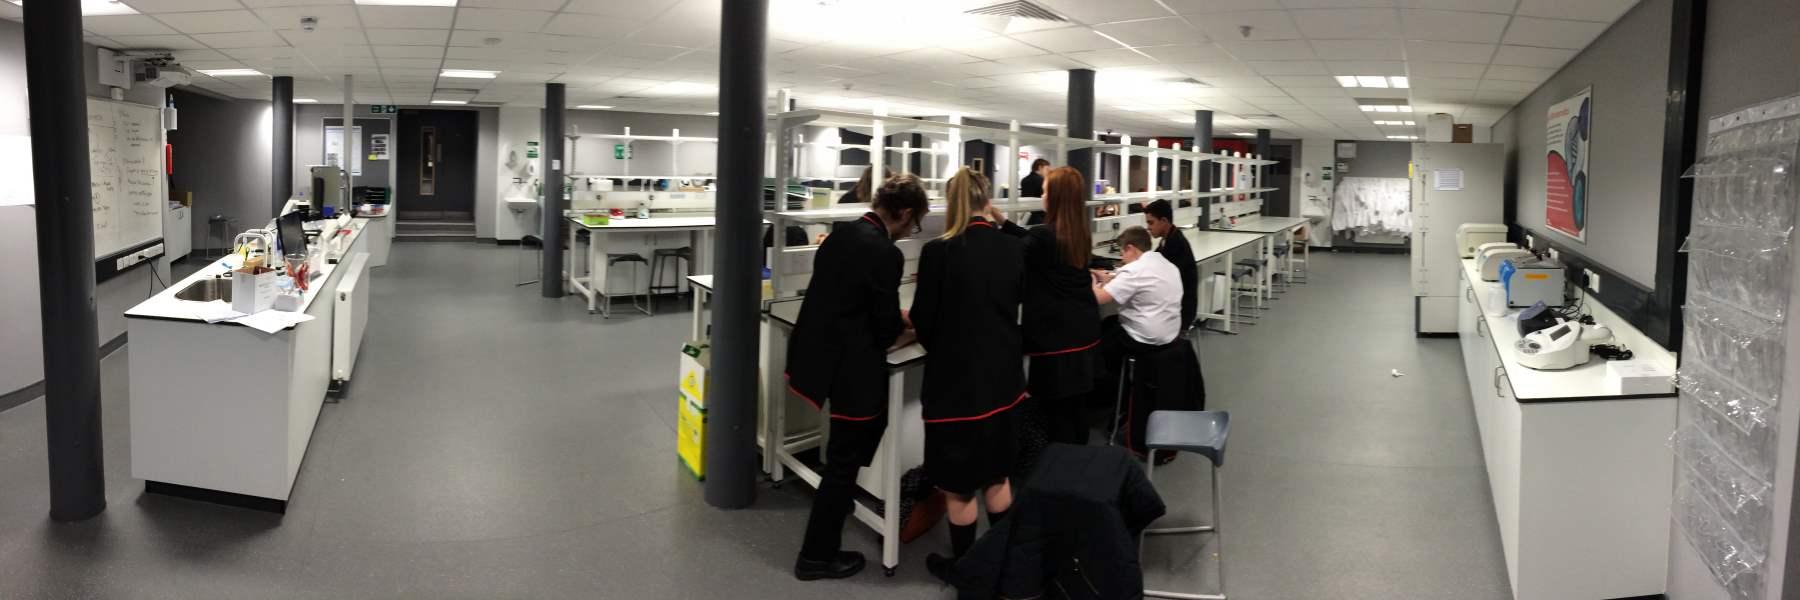 Liverpool UTC lab m.jpg